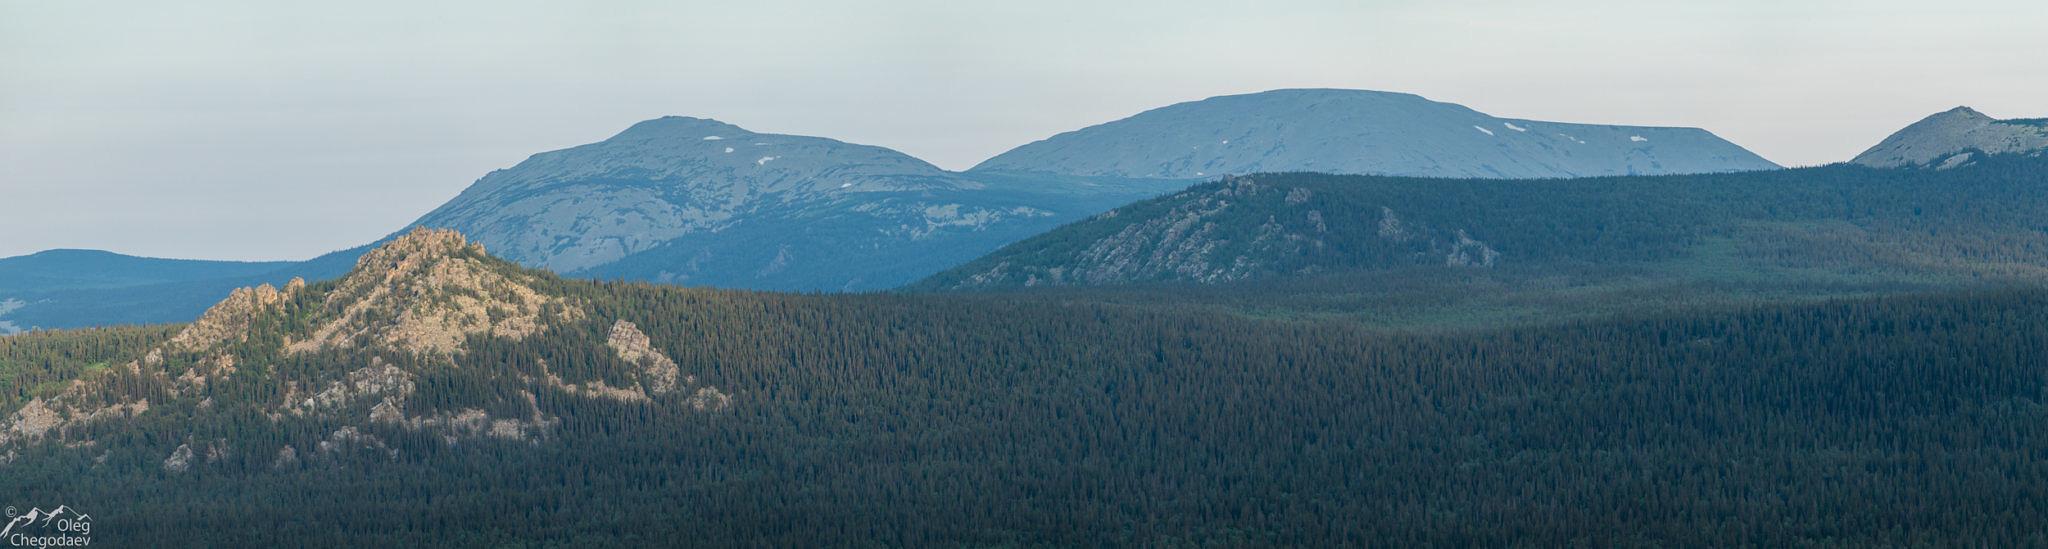 Гора Кокуй на переднем плане слева